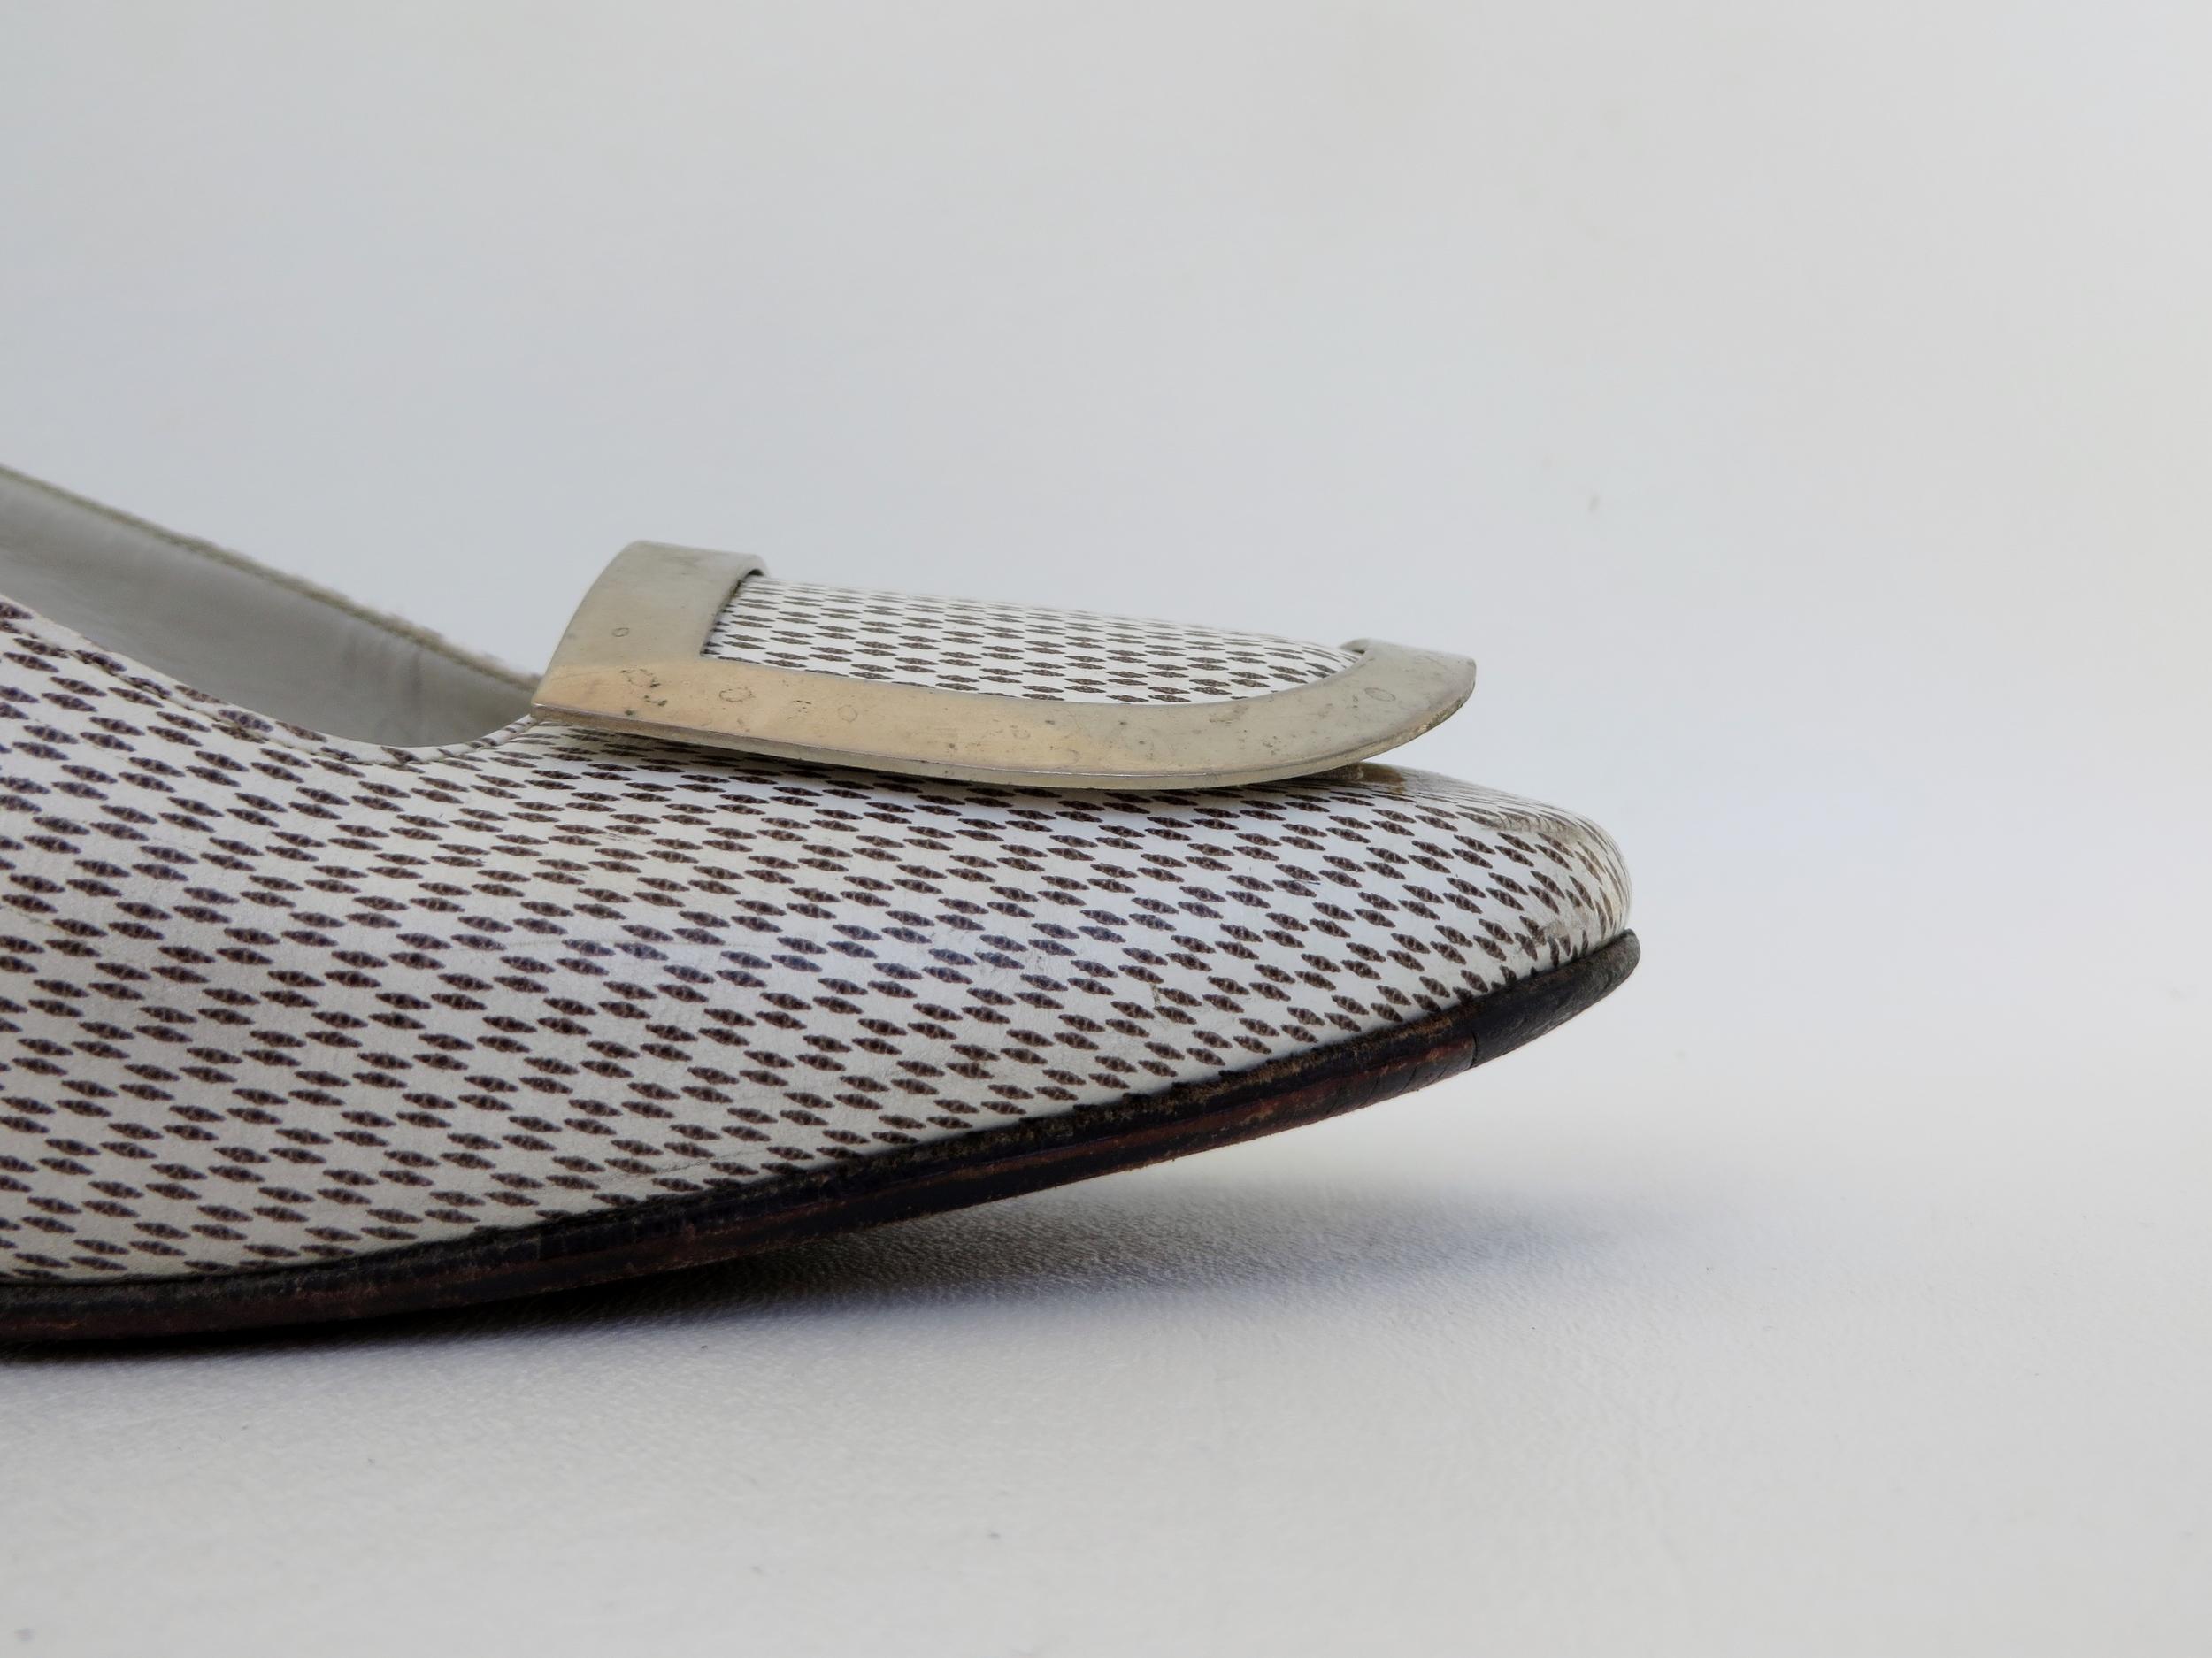 Vintage 1960's designer shoes by Roger Vivier of Paris, coming soon to  4 Birds Vintage